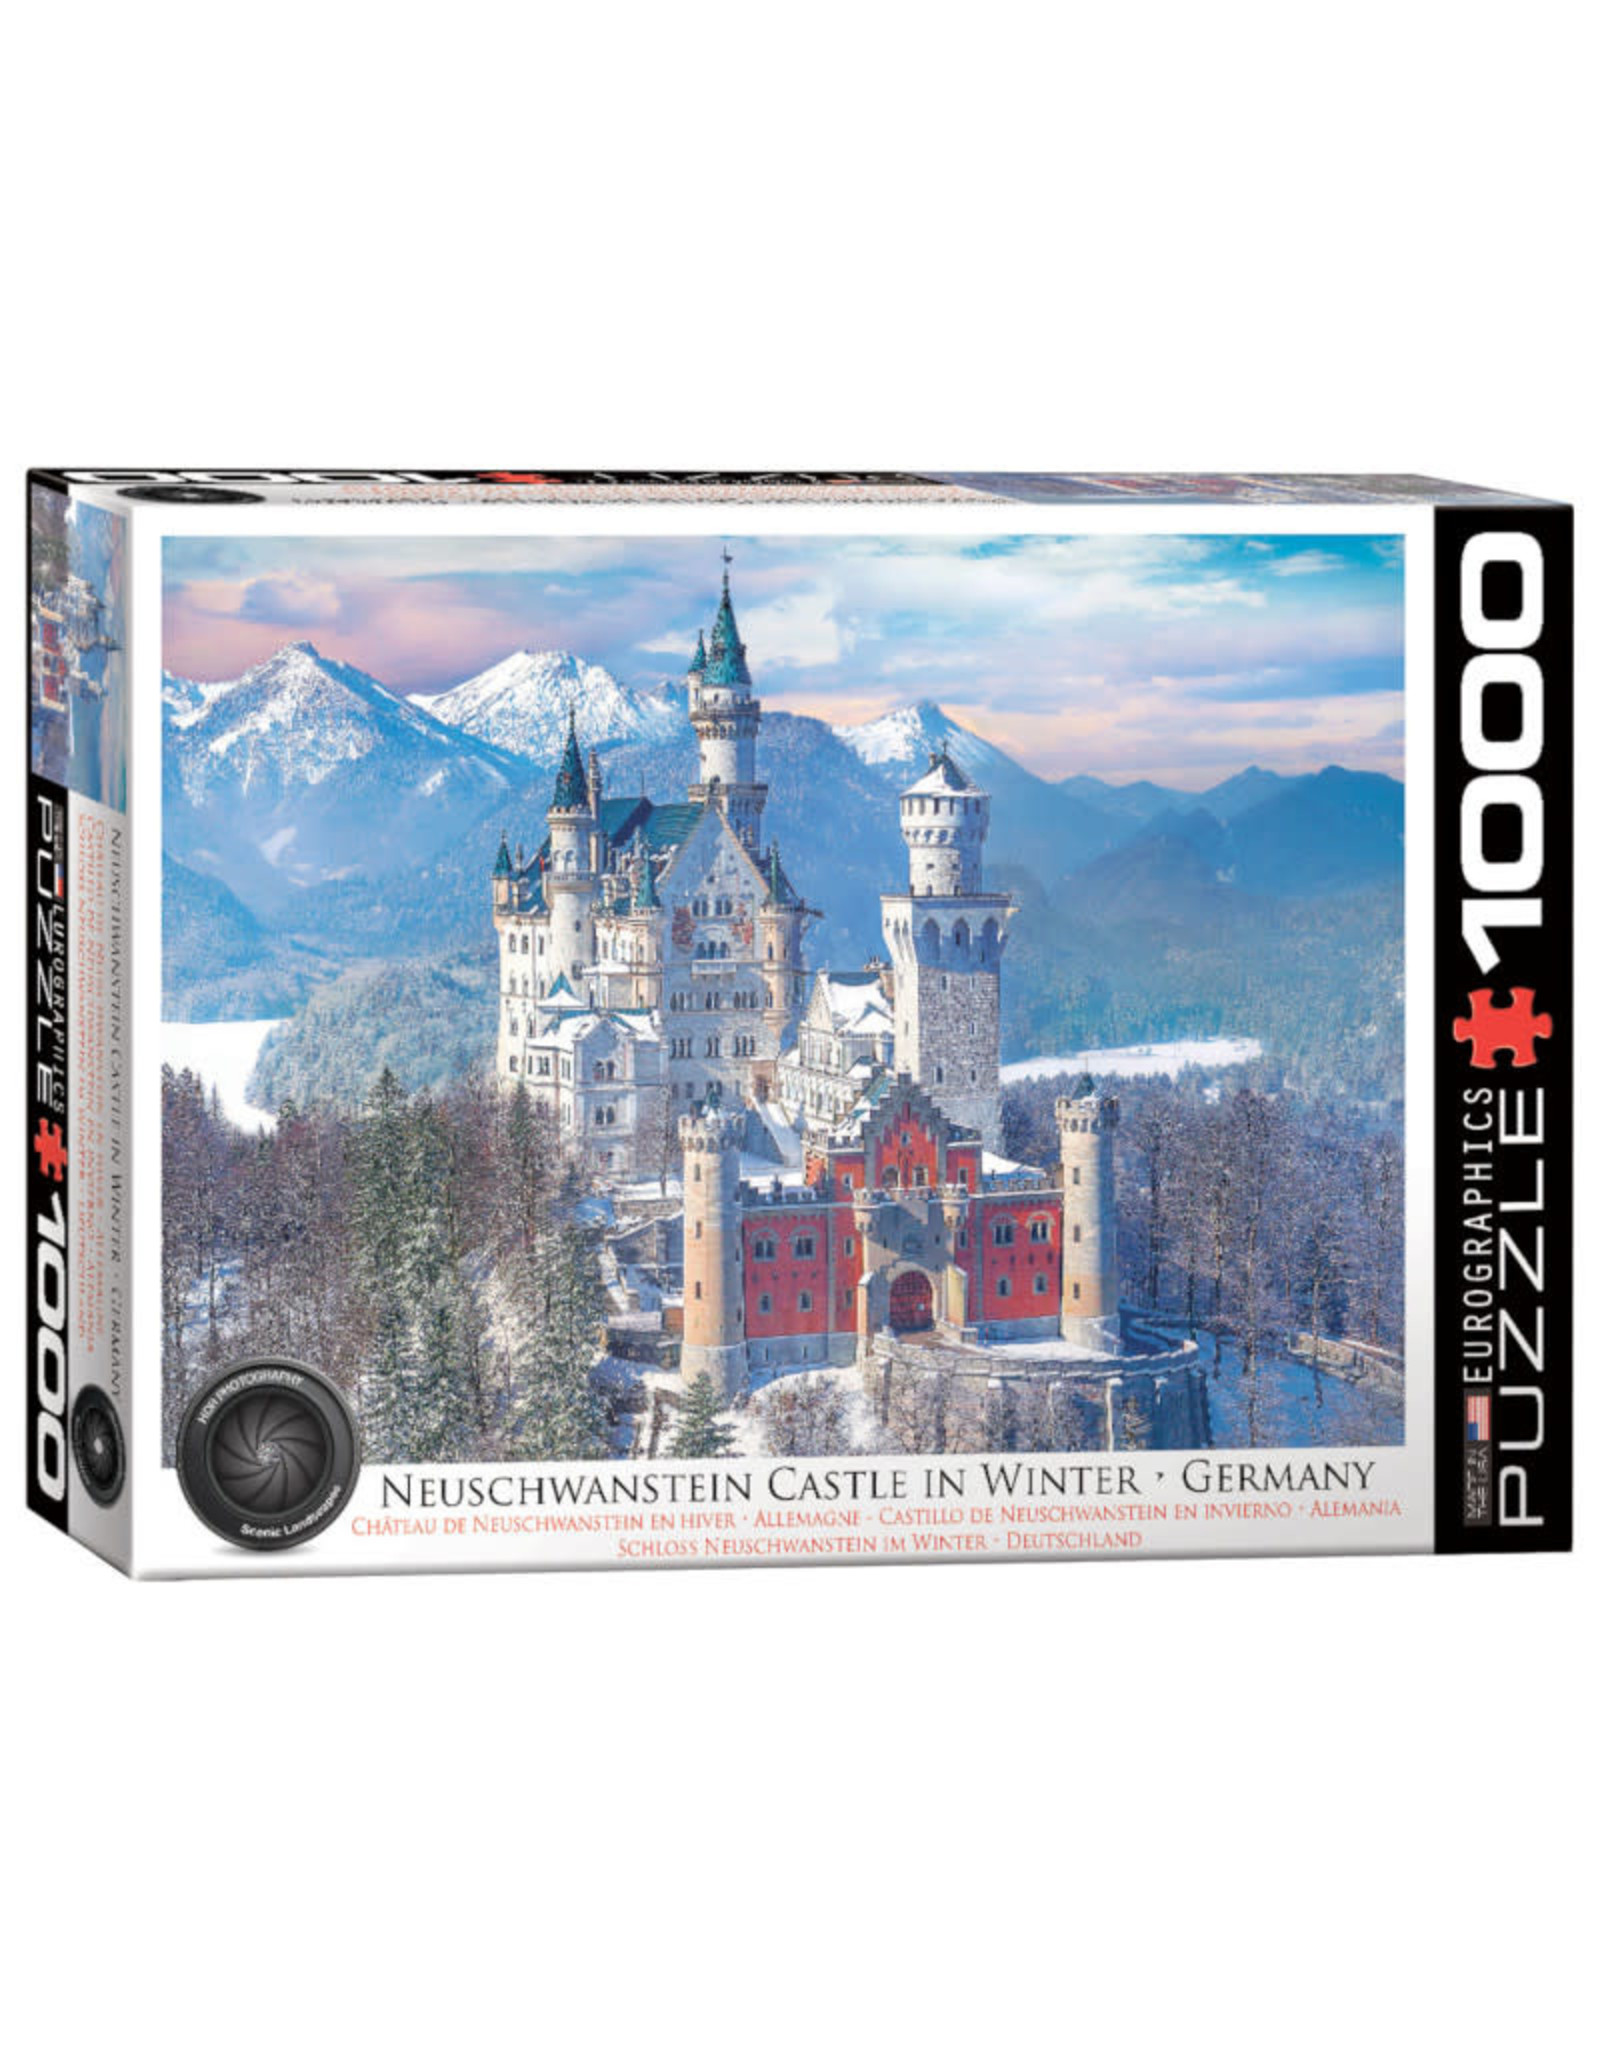 Eurographics Neuschwanstein Castle in Winter 1000 PCS